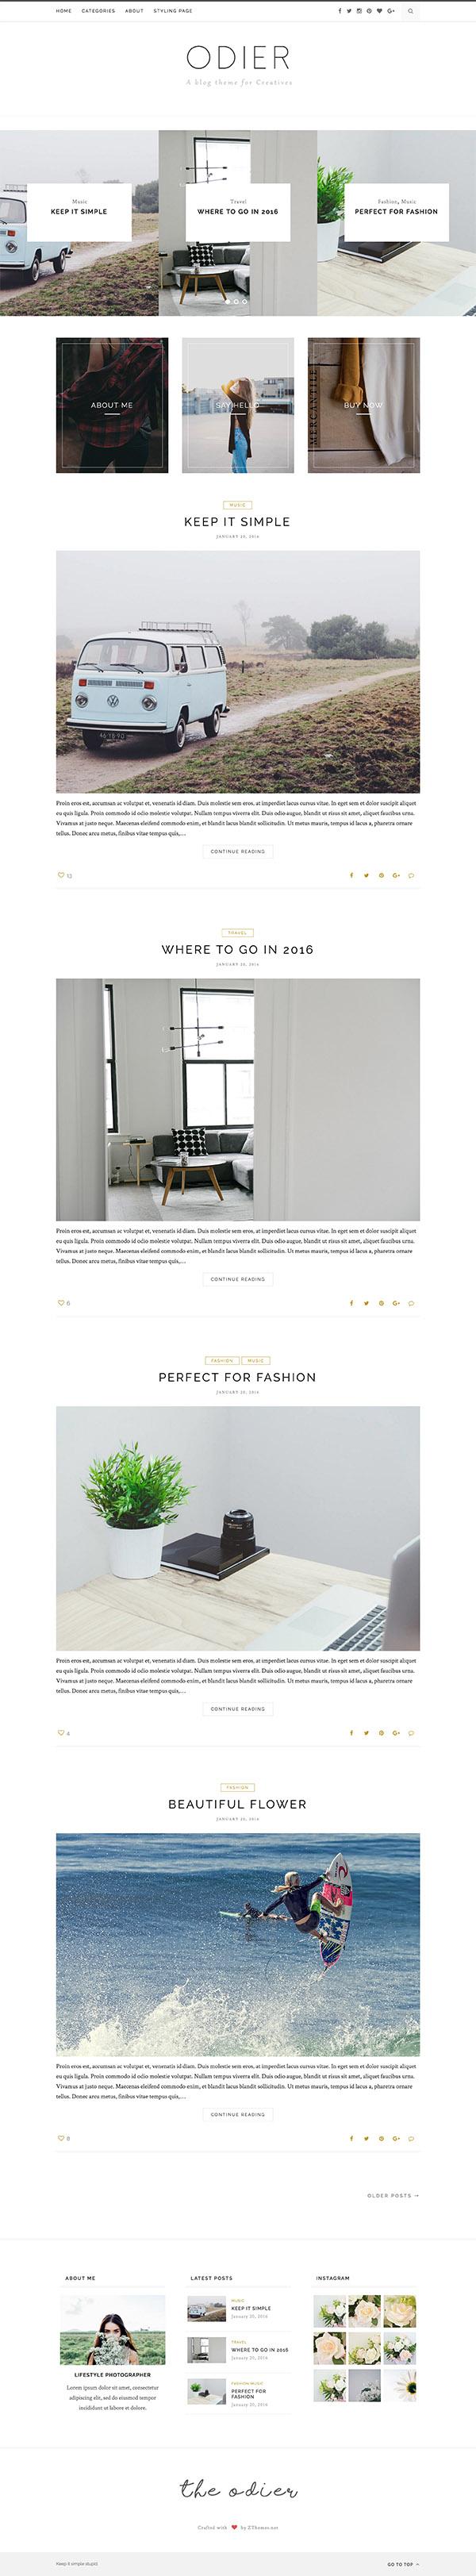 03 Odier - Simple & Elegant WordPress Blog Theme